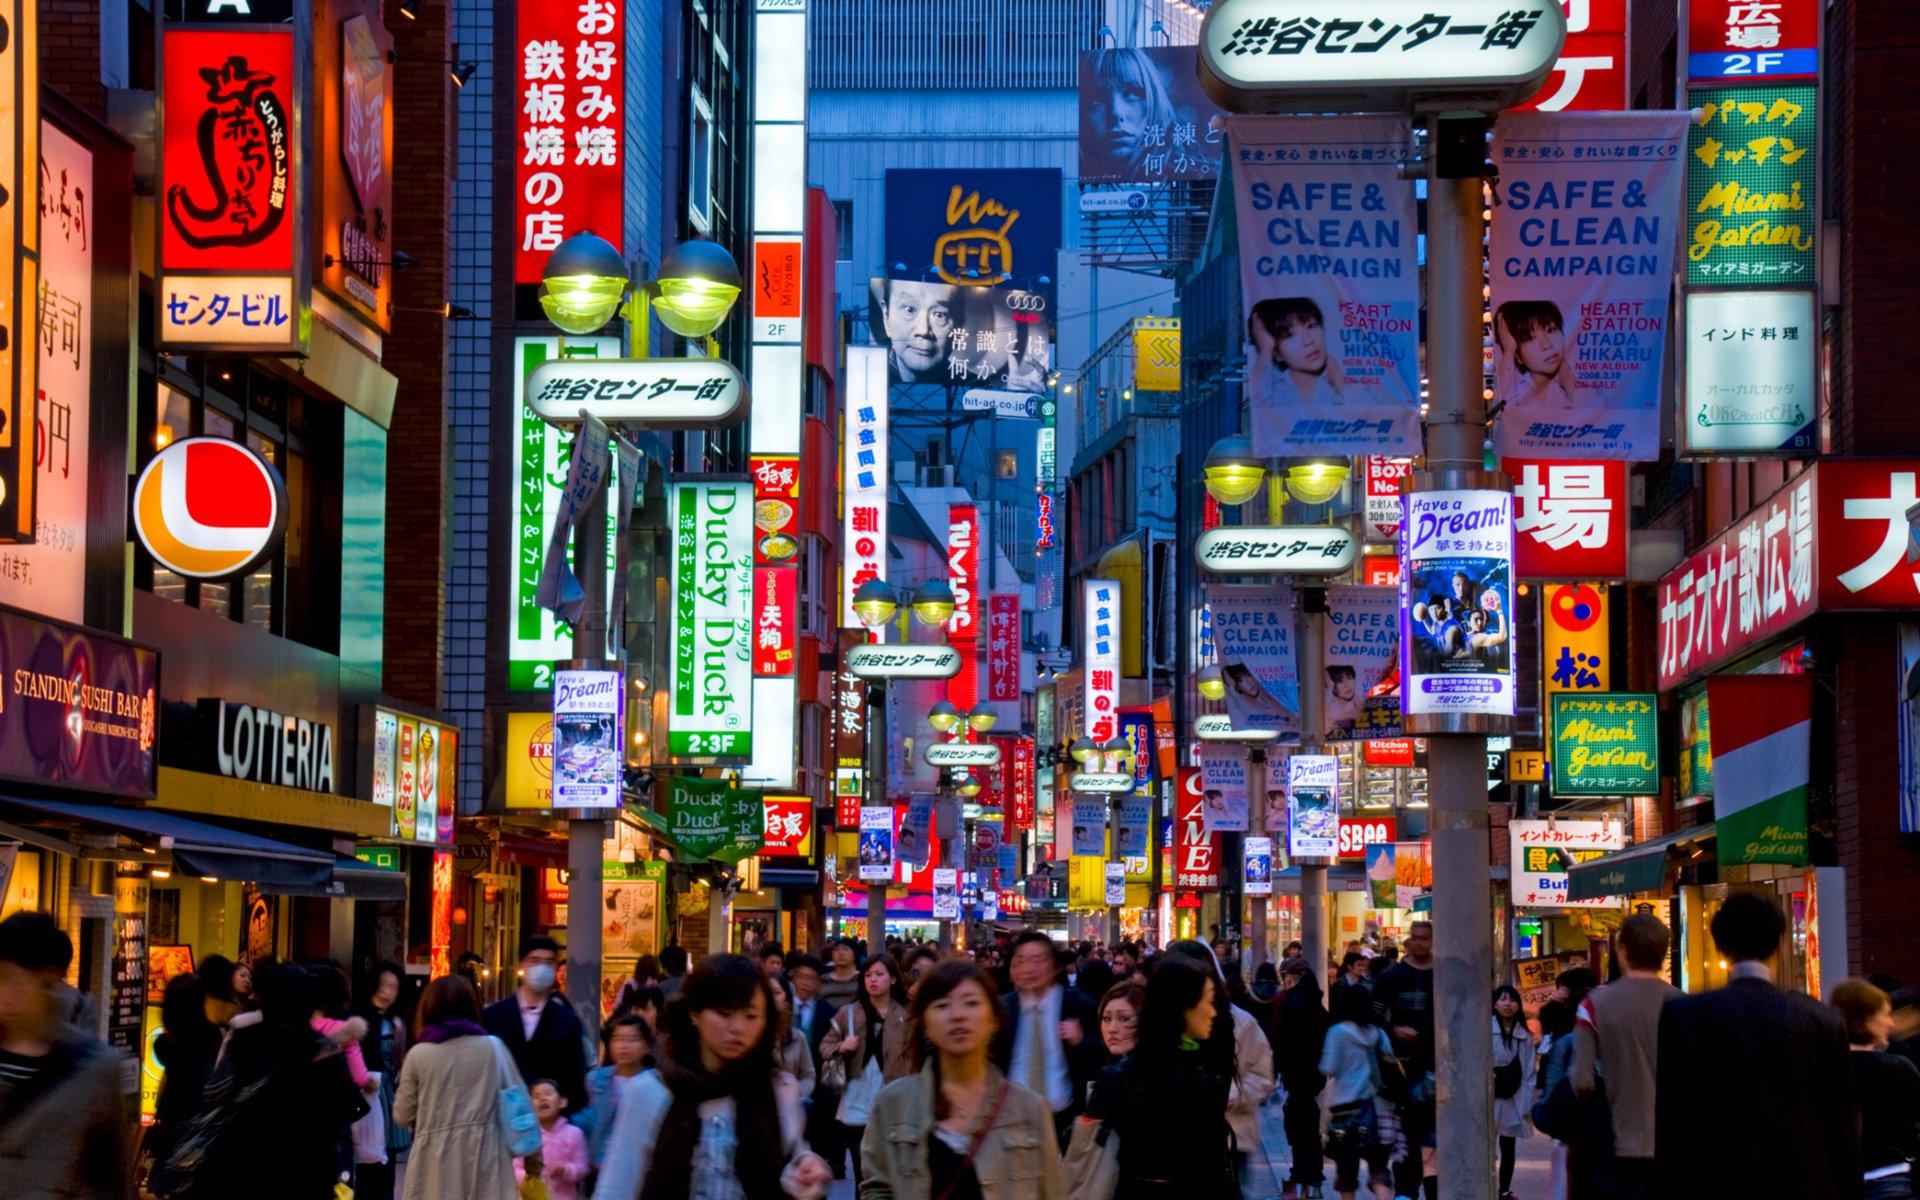 东京涉谷区繁忙的街道。/Gettyimages